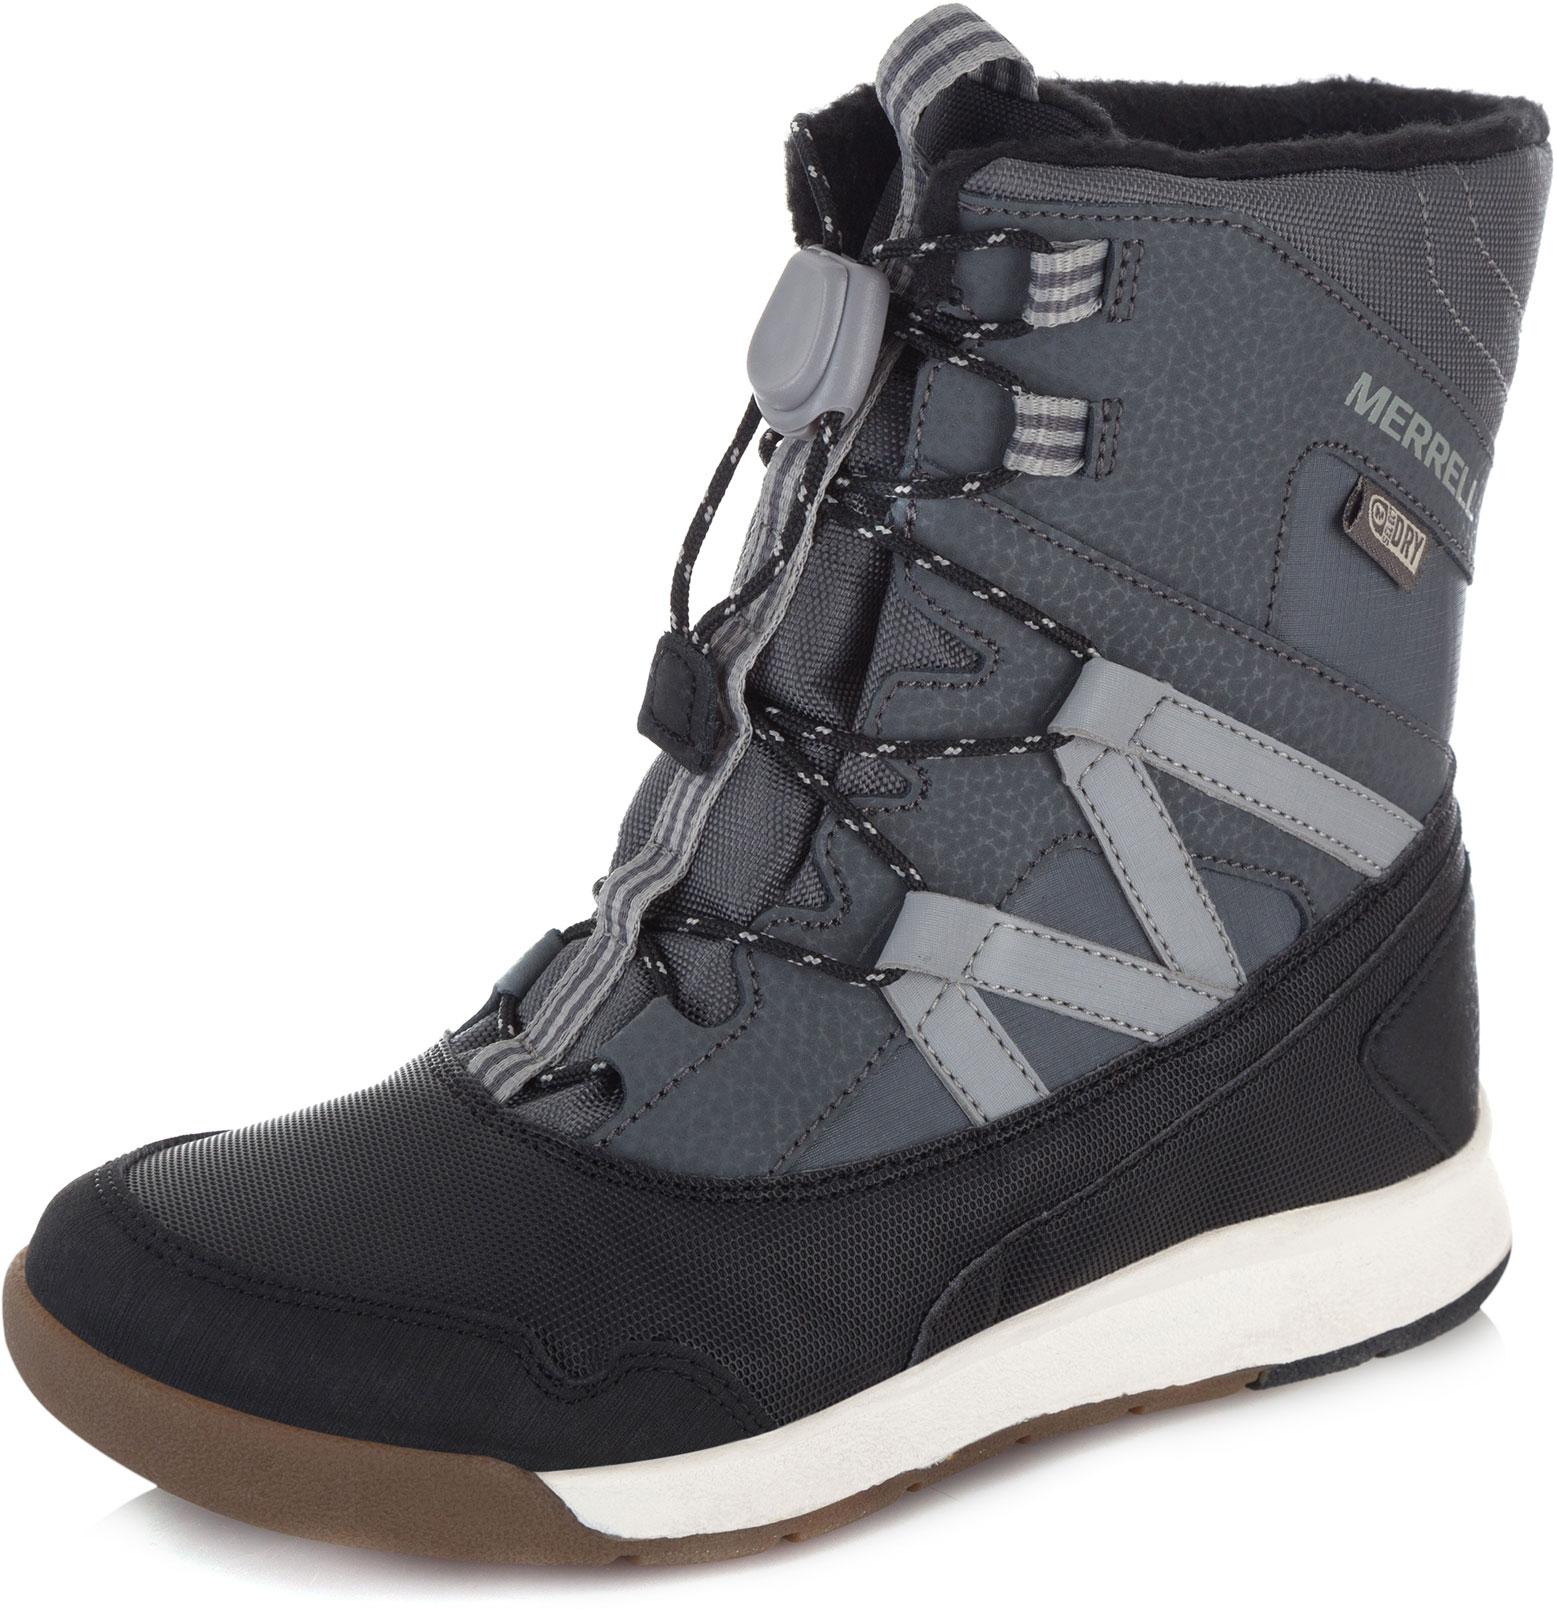 Ботинки Merrell M-Snow Crush Wtrpf